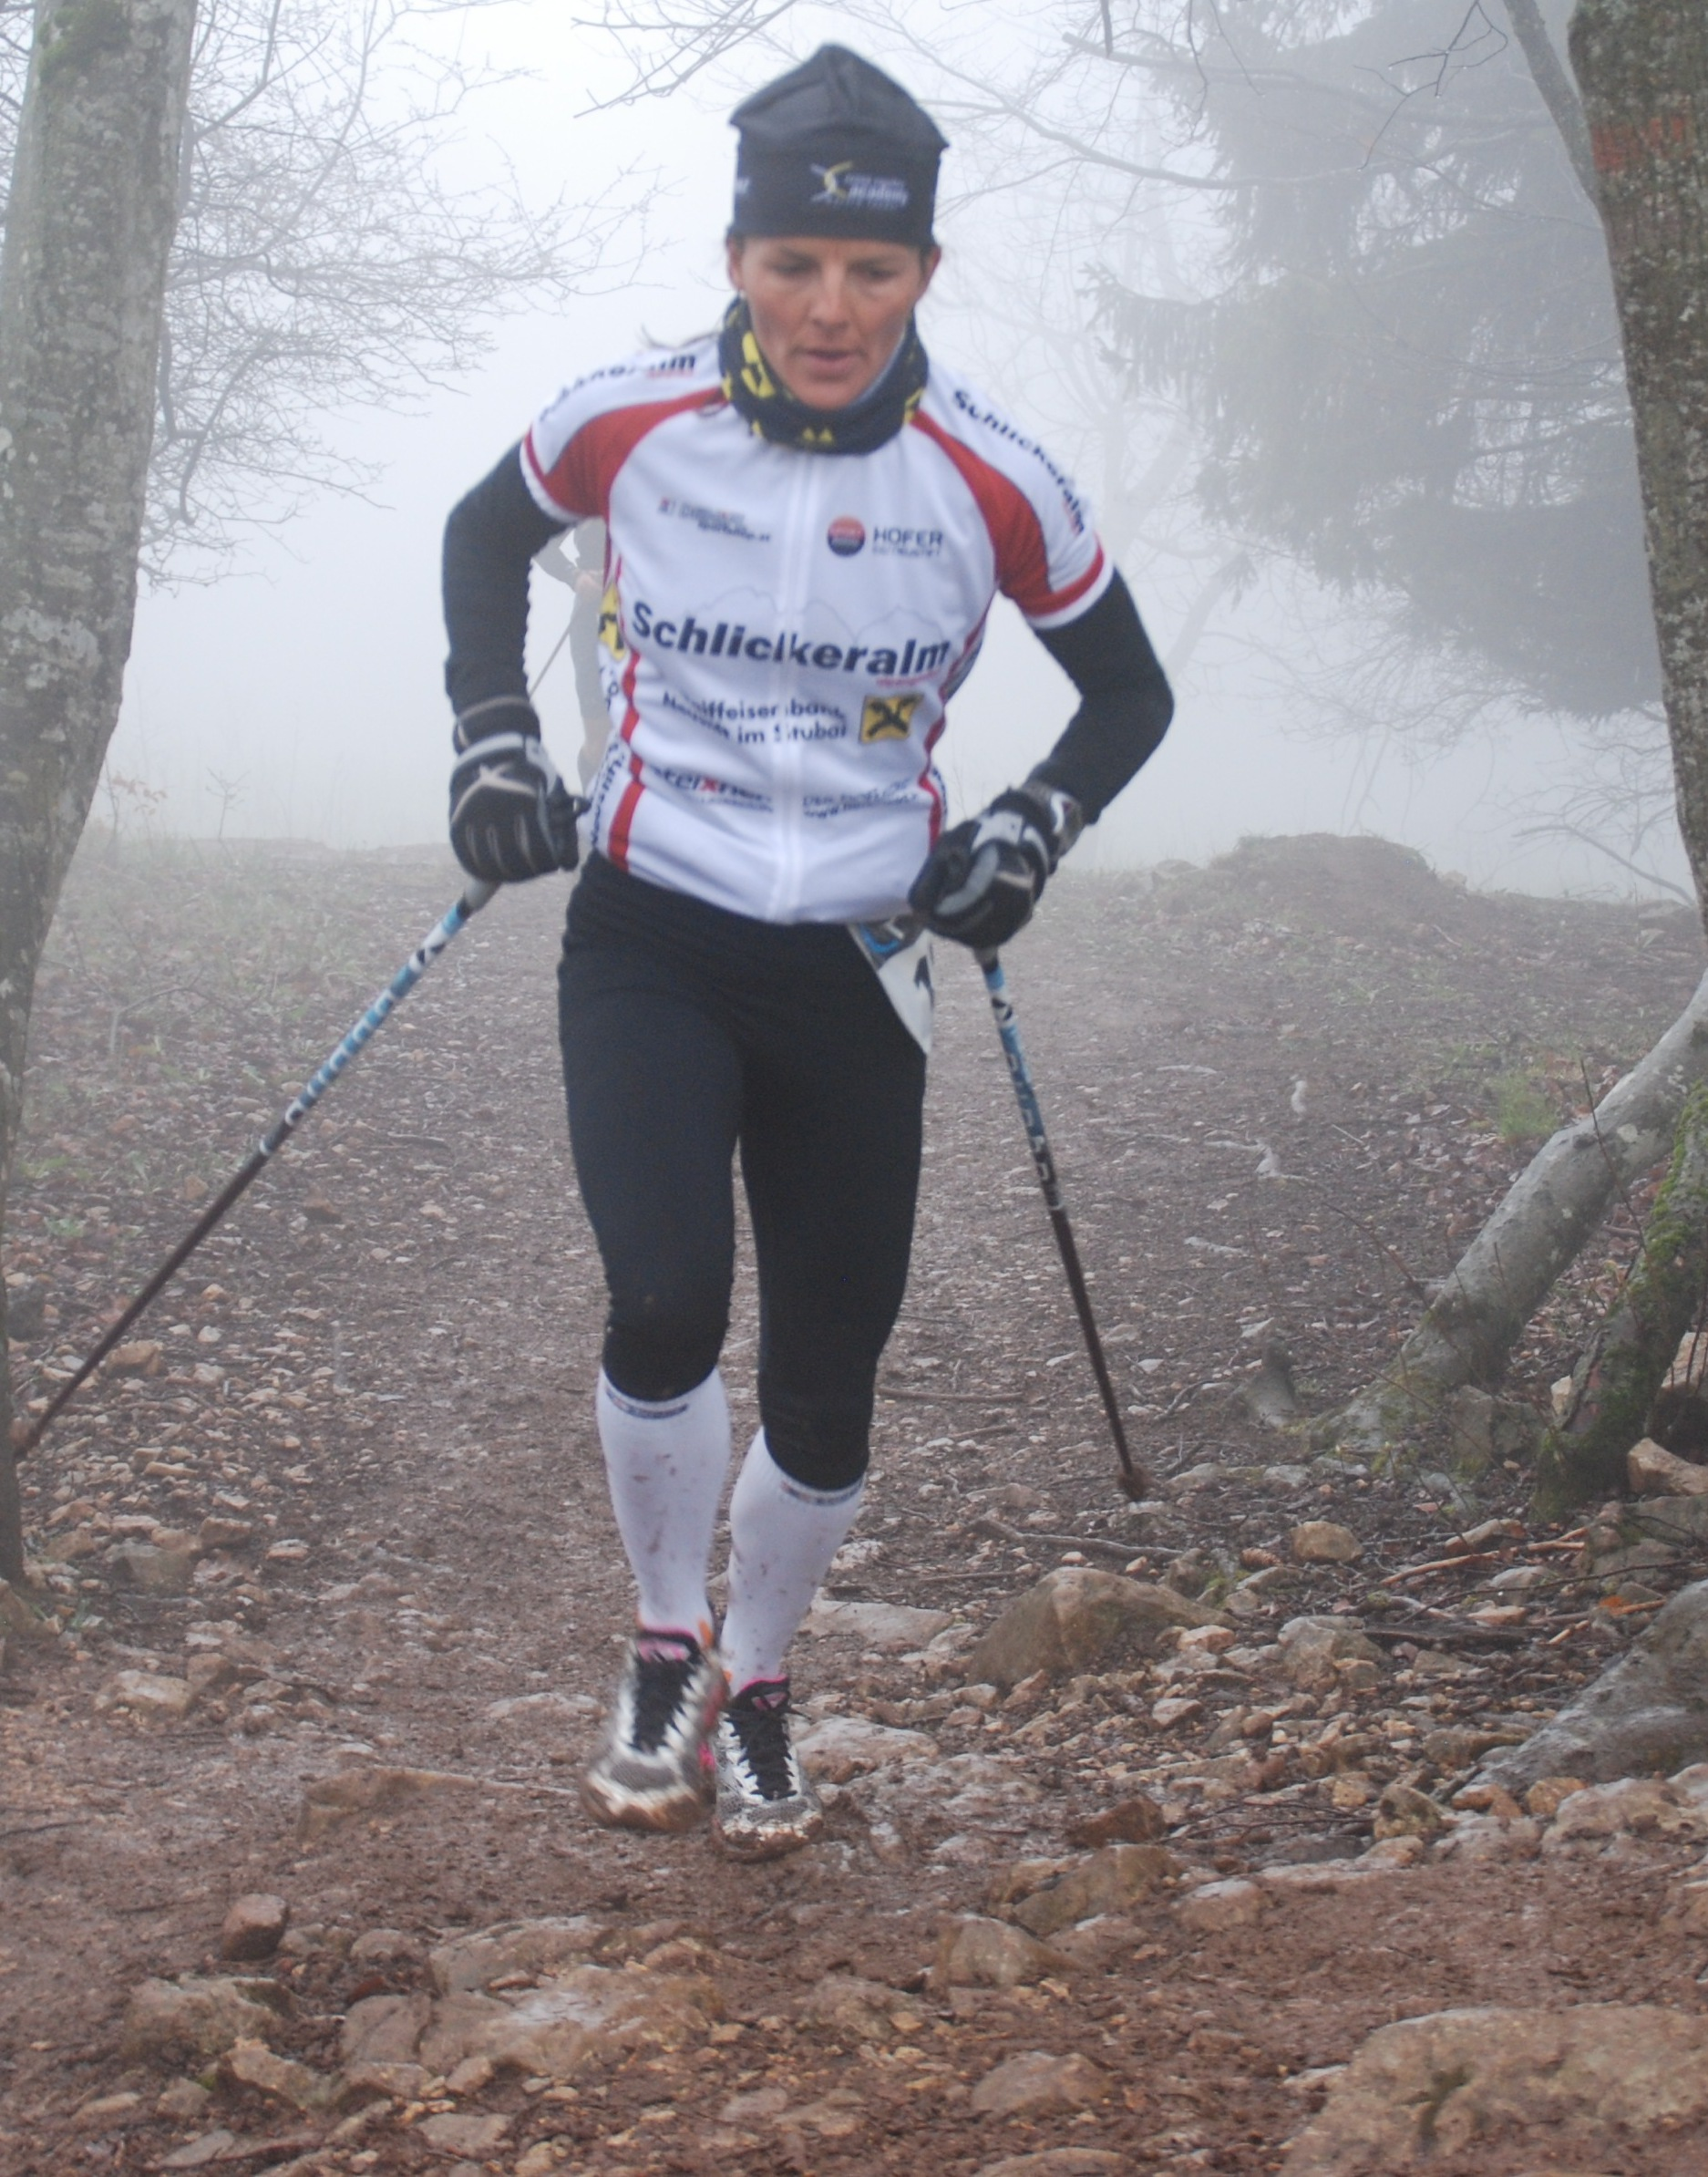 Andréa Reithmayr 1 - L'ULTRA MONTEE DU SALEVE EN LIGNE DE MIRE / 13-04-13